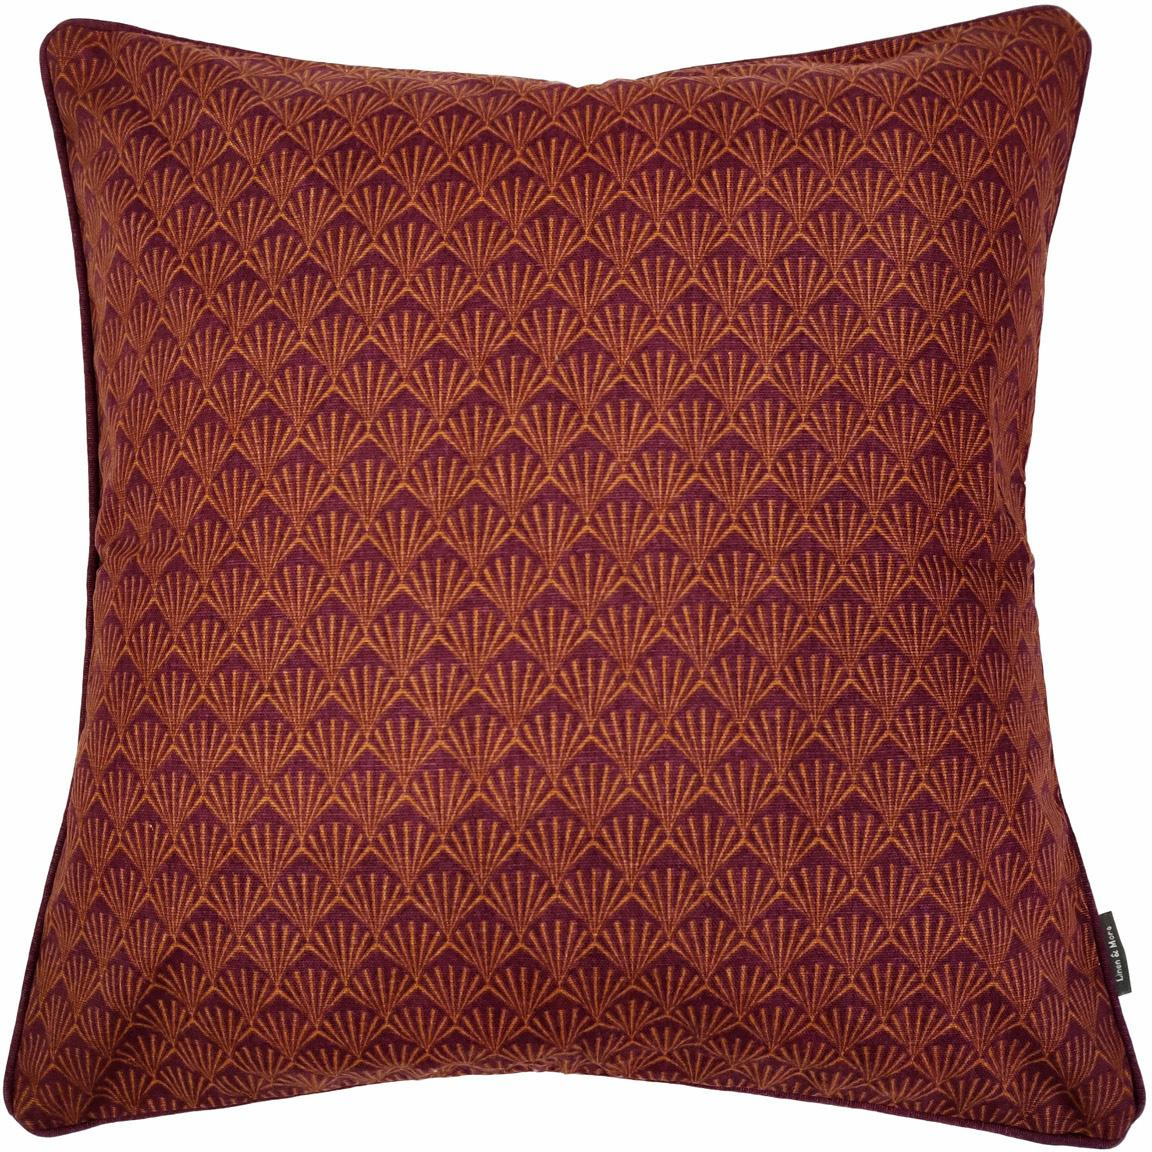 Cuscino con motivo elegante e imbottitura Feather, Rivestimento: 100% cotone, Borgogna, arancione, Larg. 45 x Lung. 45 cm